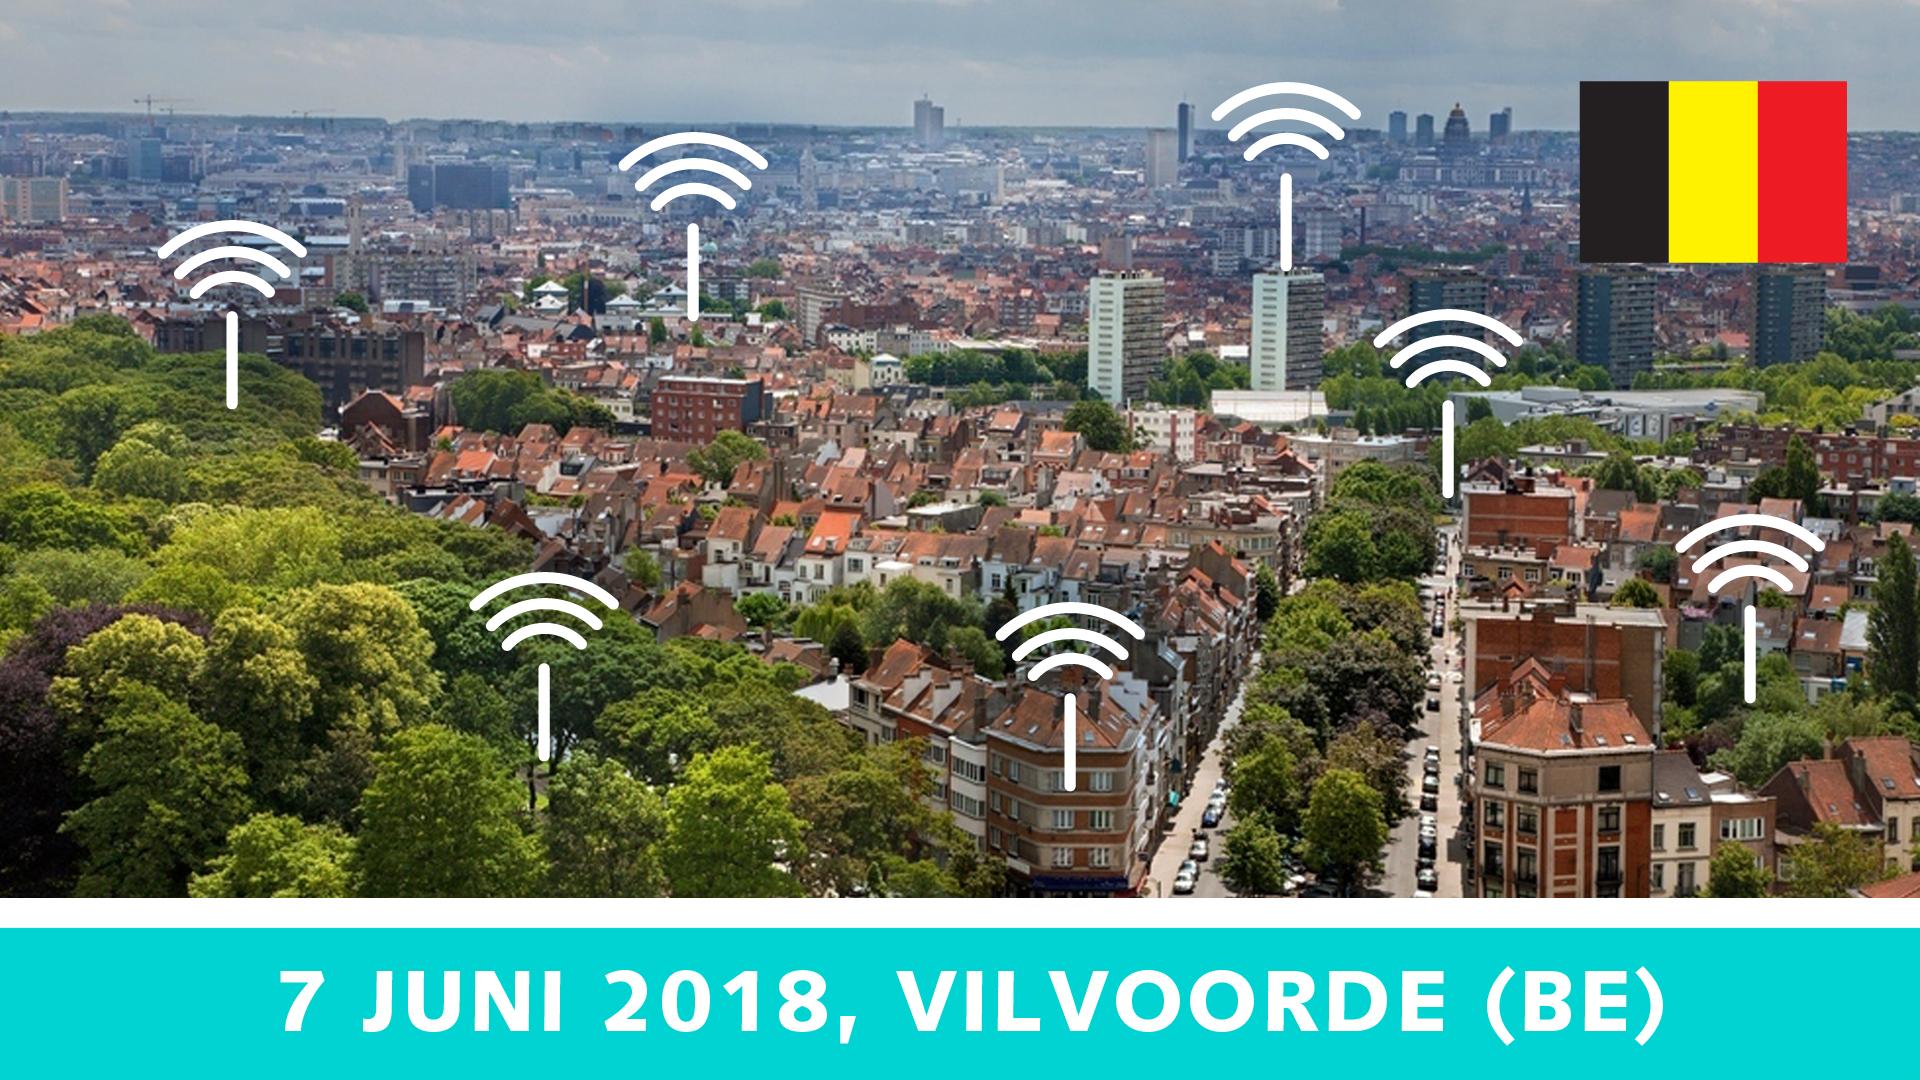 LPWAN (LoRa/Sigfox/NB-IoT) & IoT Suite – 7 juni 2018 | Pushing the limits of communication technology | MCS